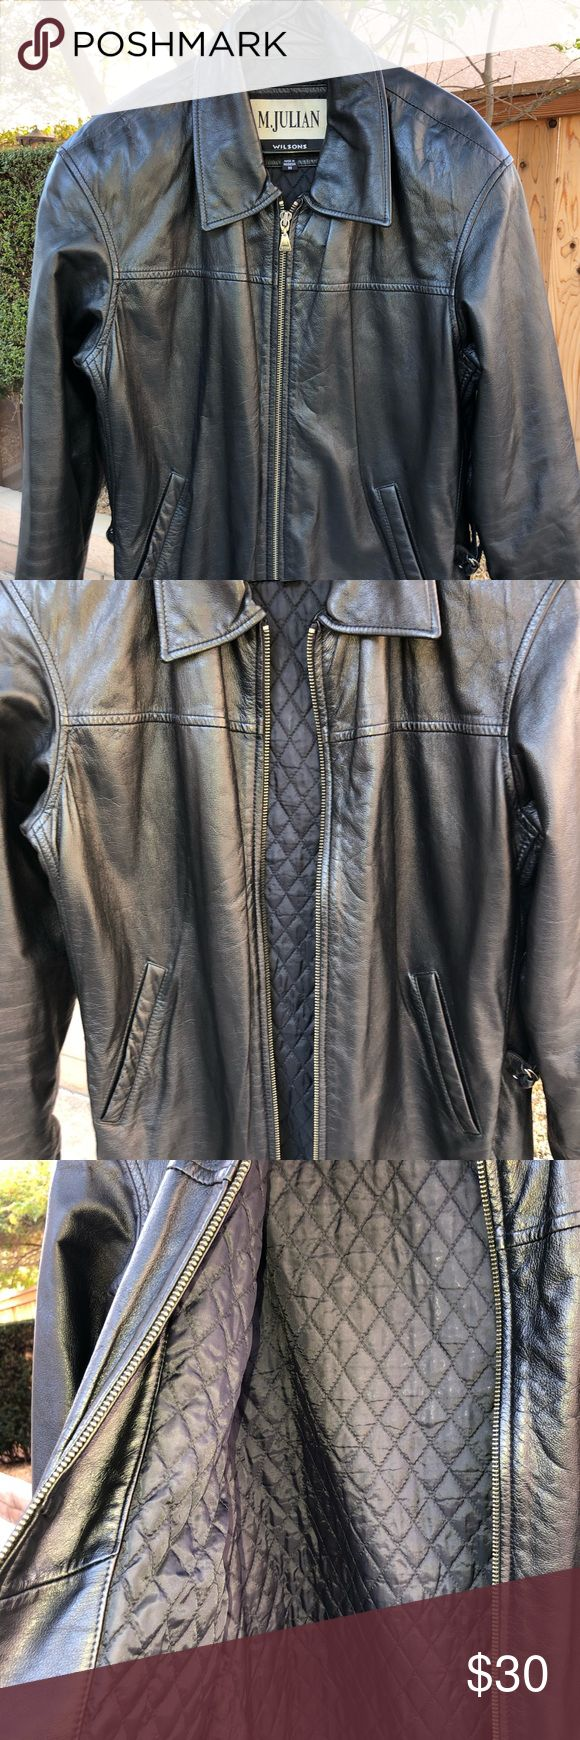 Wilson M. Julian black leather jacket size M Unisex